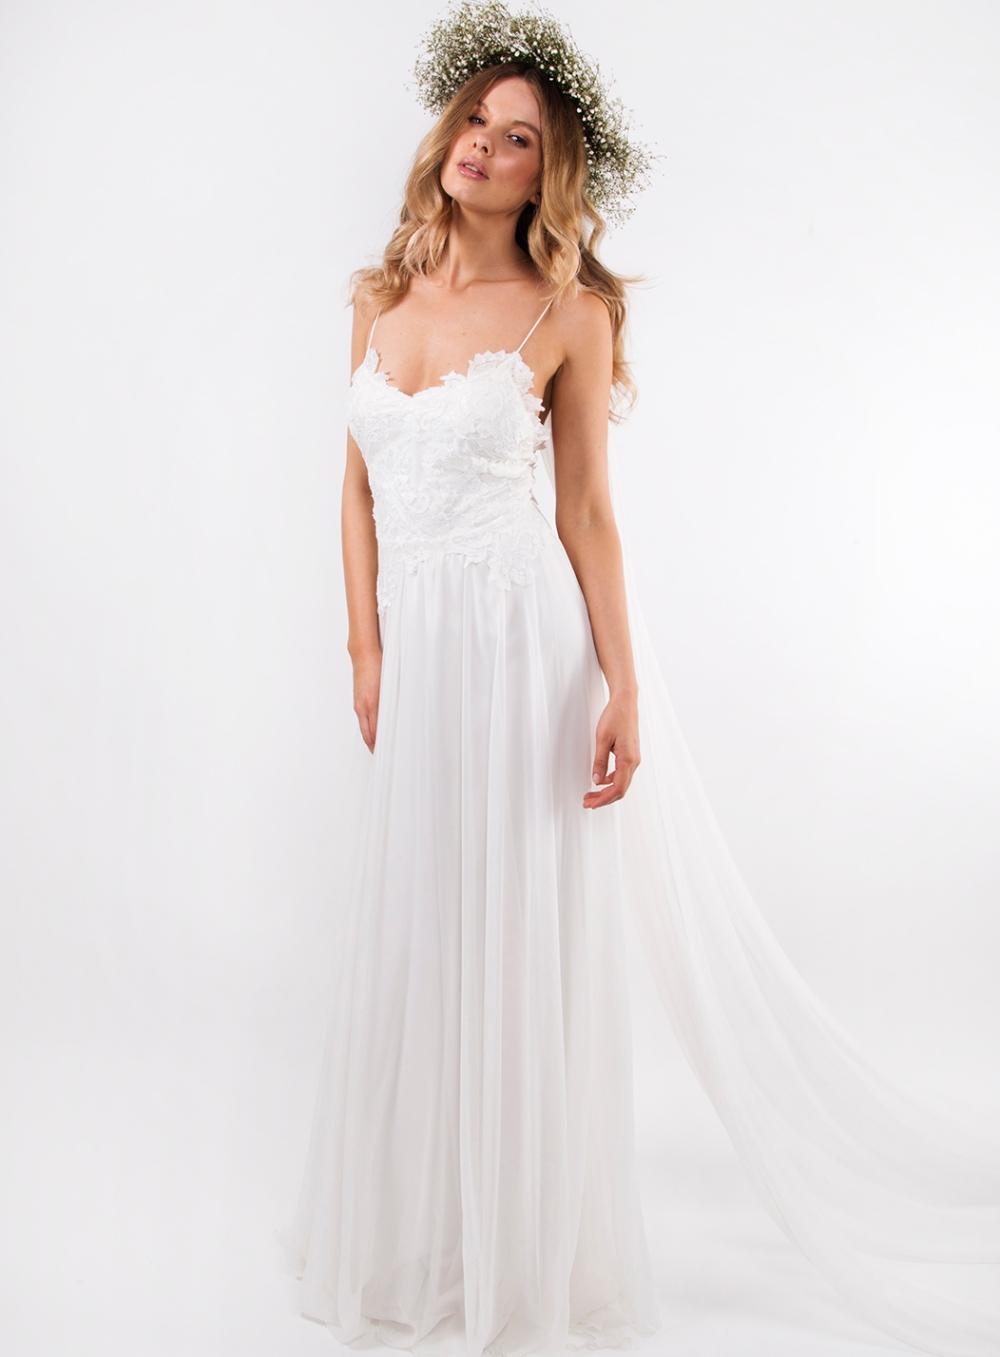 Stunning_Aline_Backless_Spaghetti_Straps_Appliques_Wedding_Dress.jpg